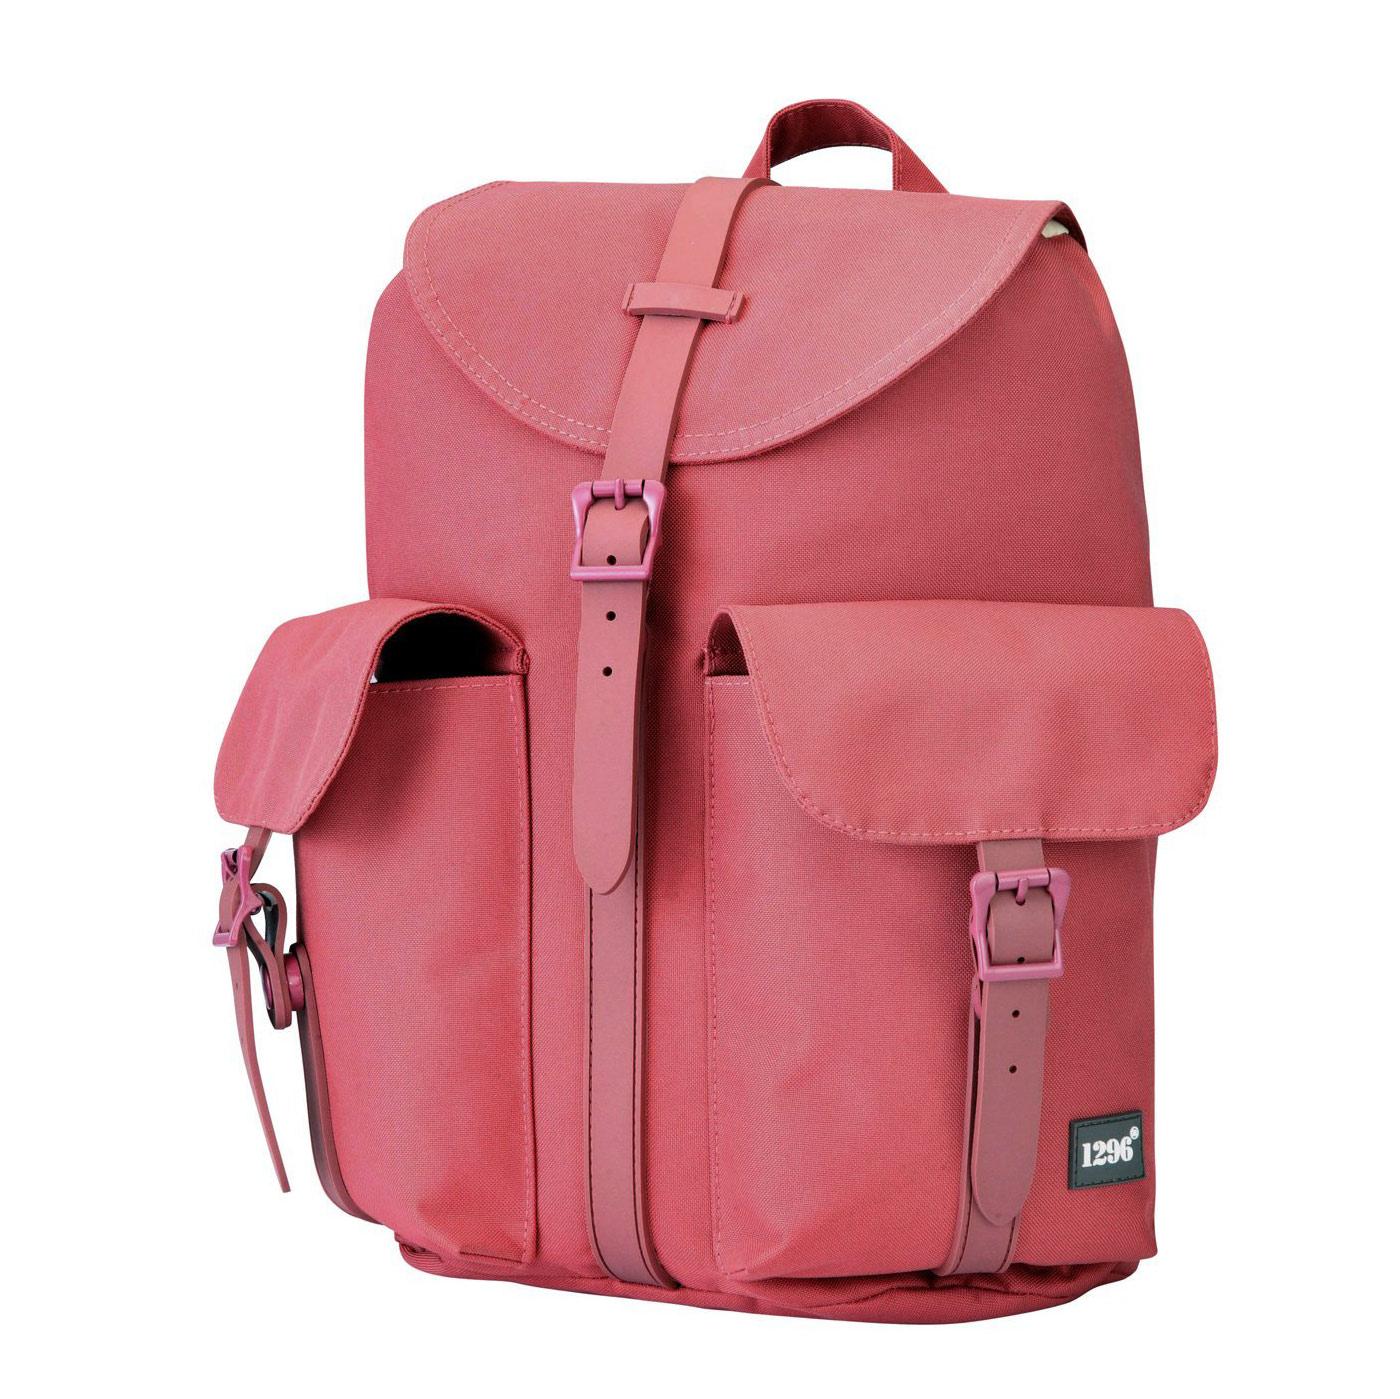 Damen Daypack in Korallrot